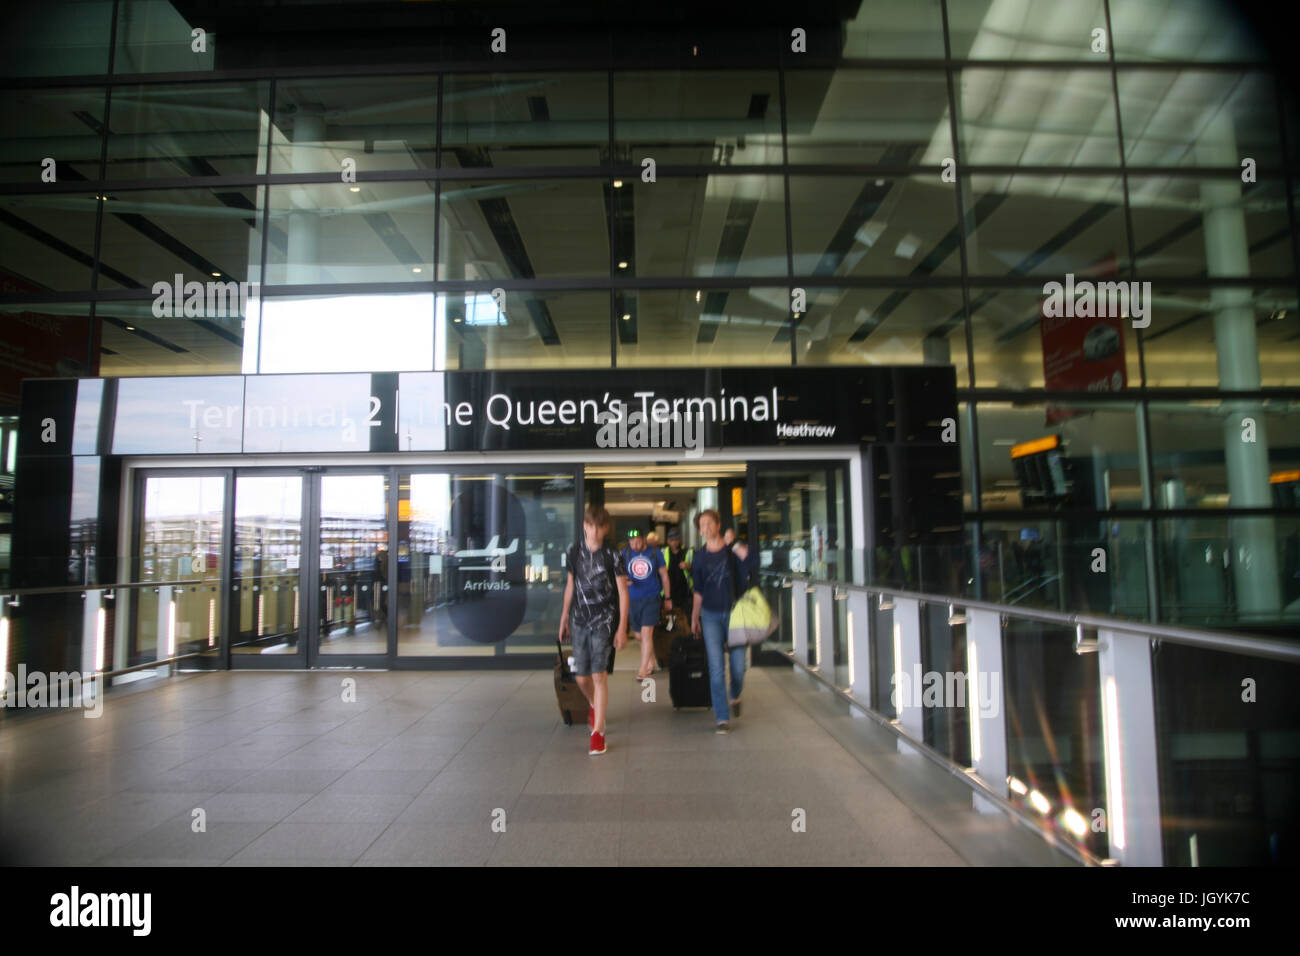 England, London, West, Heathrow Airport, New Terminal 2. - Stock Image